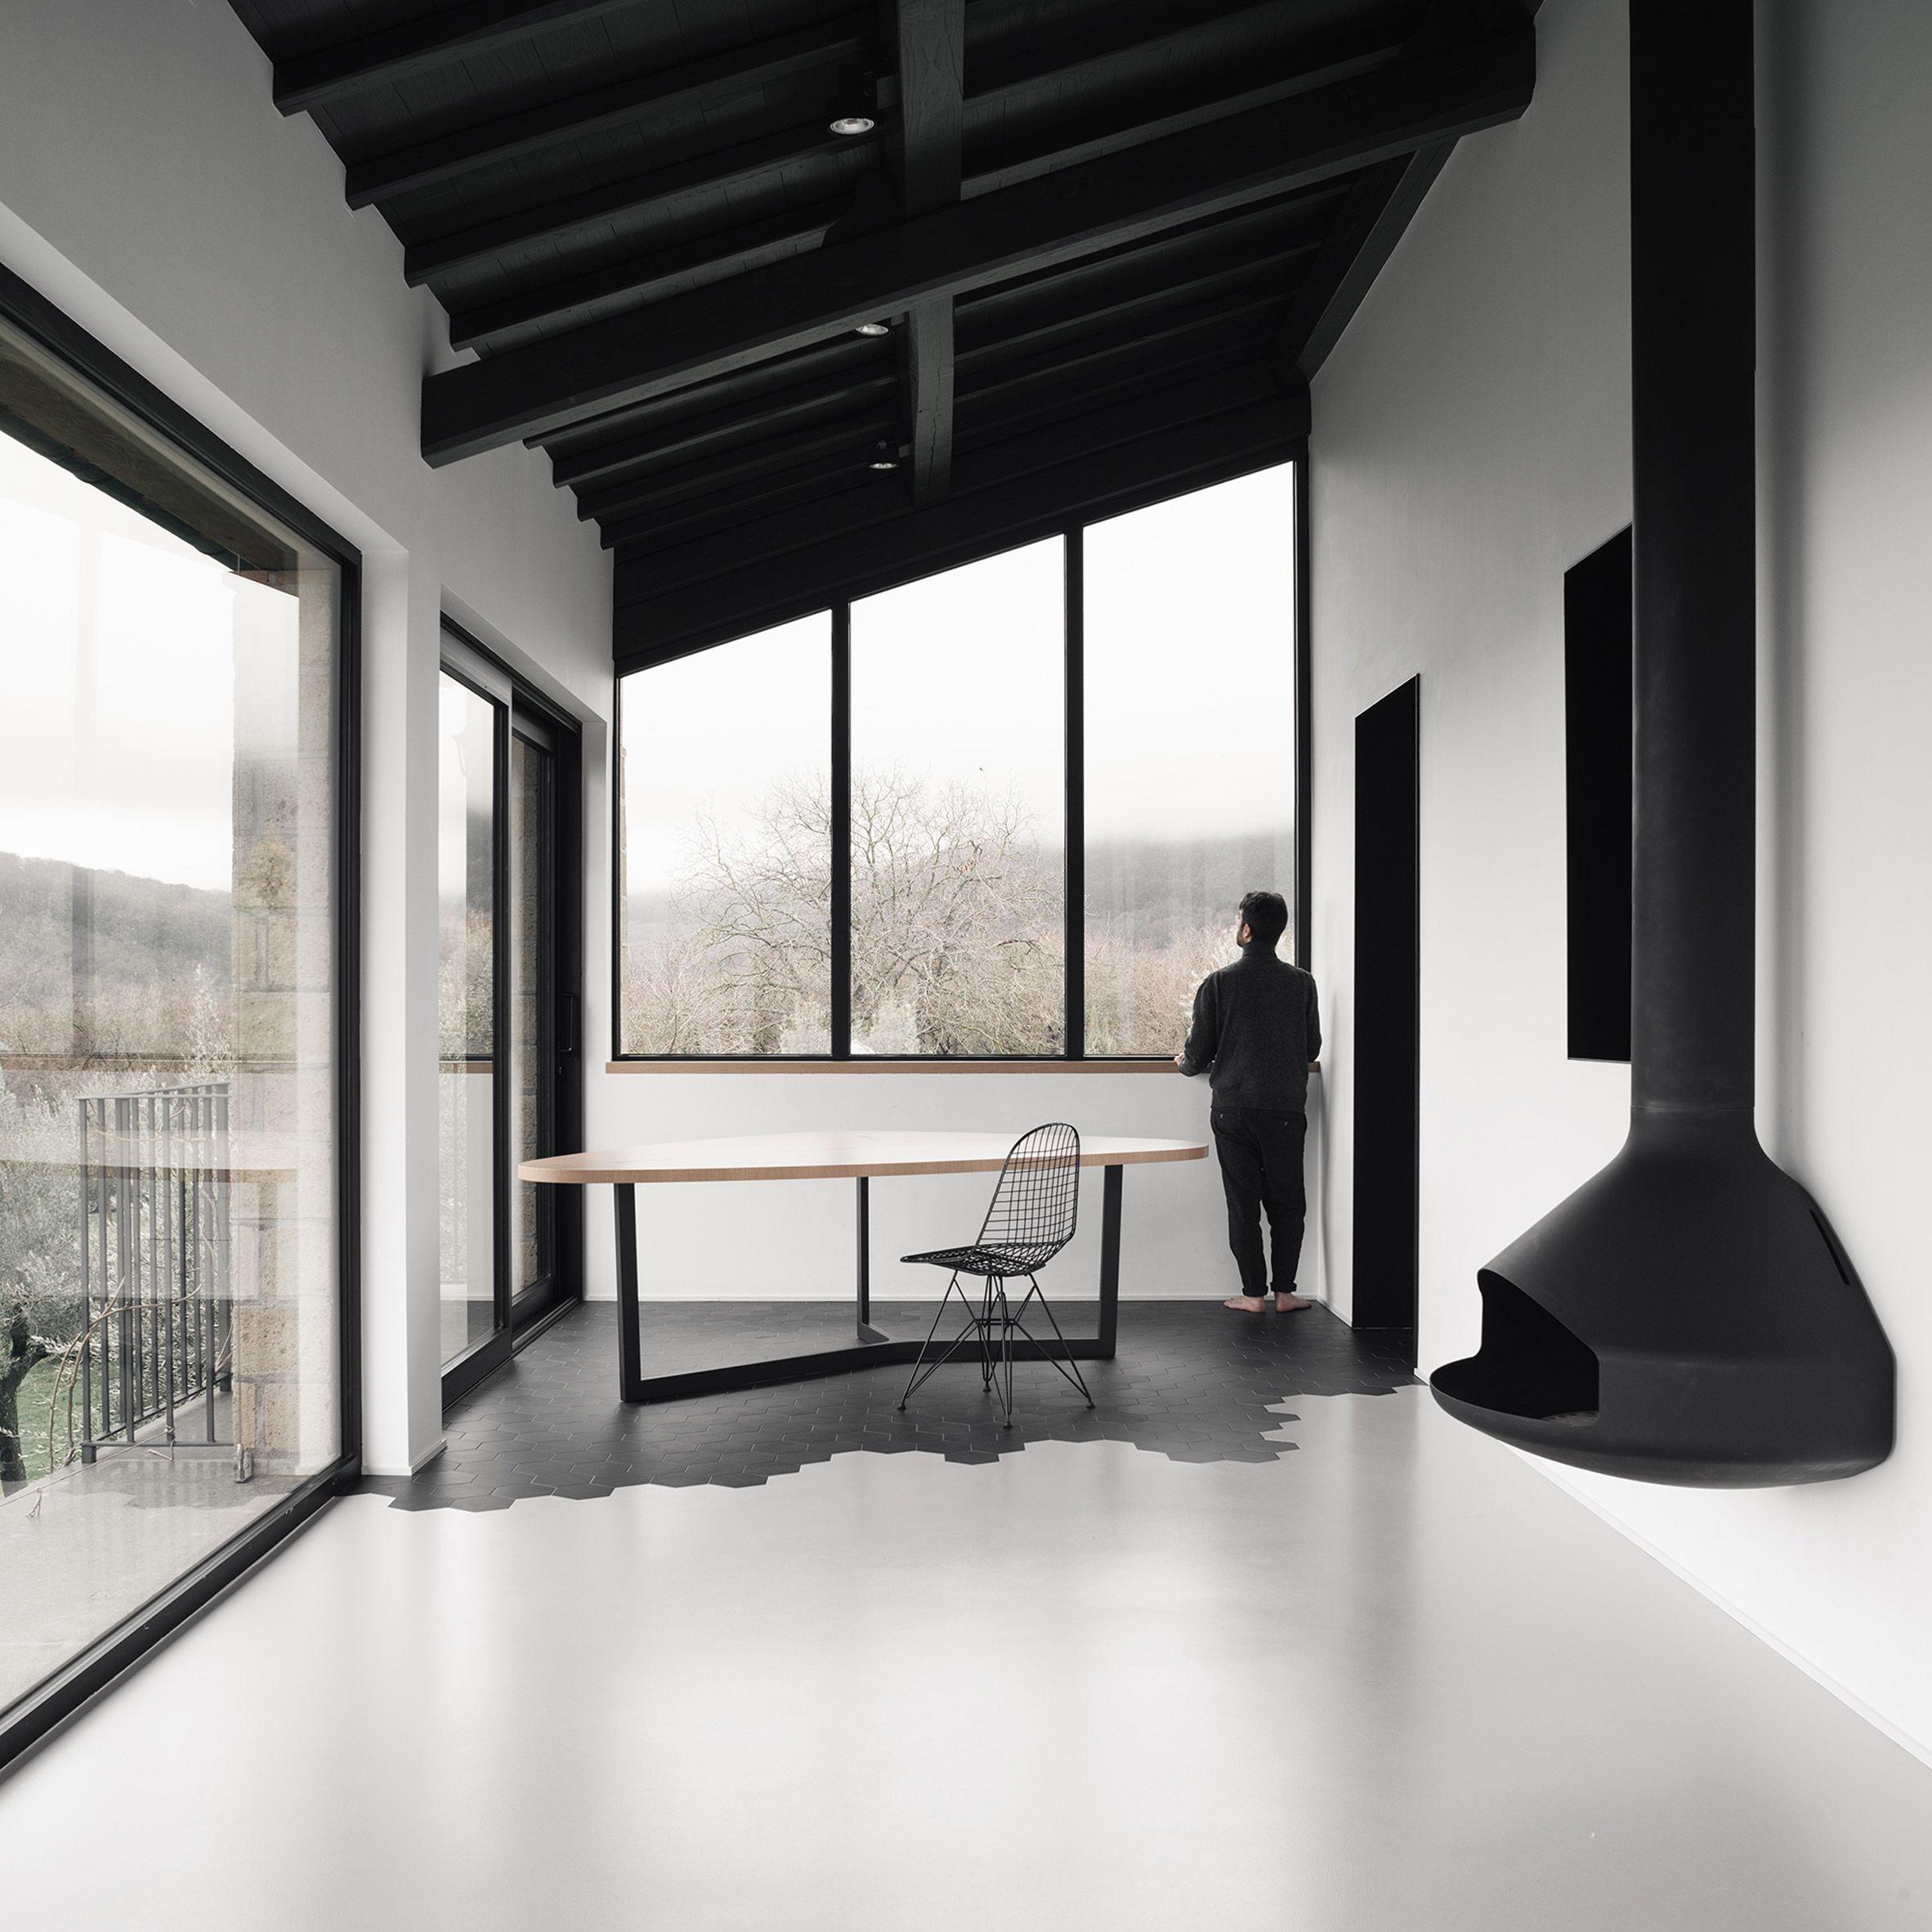 Monochrome Materials Define Living Spaces Inside Converted Italian  Farmhouse Architecture Office Deltastudio Used A Palette Of